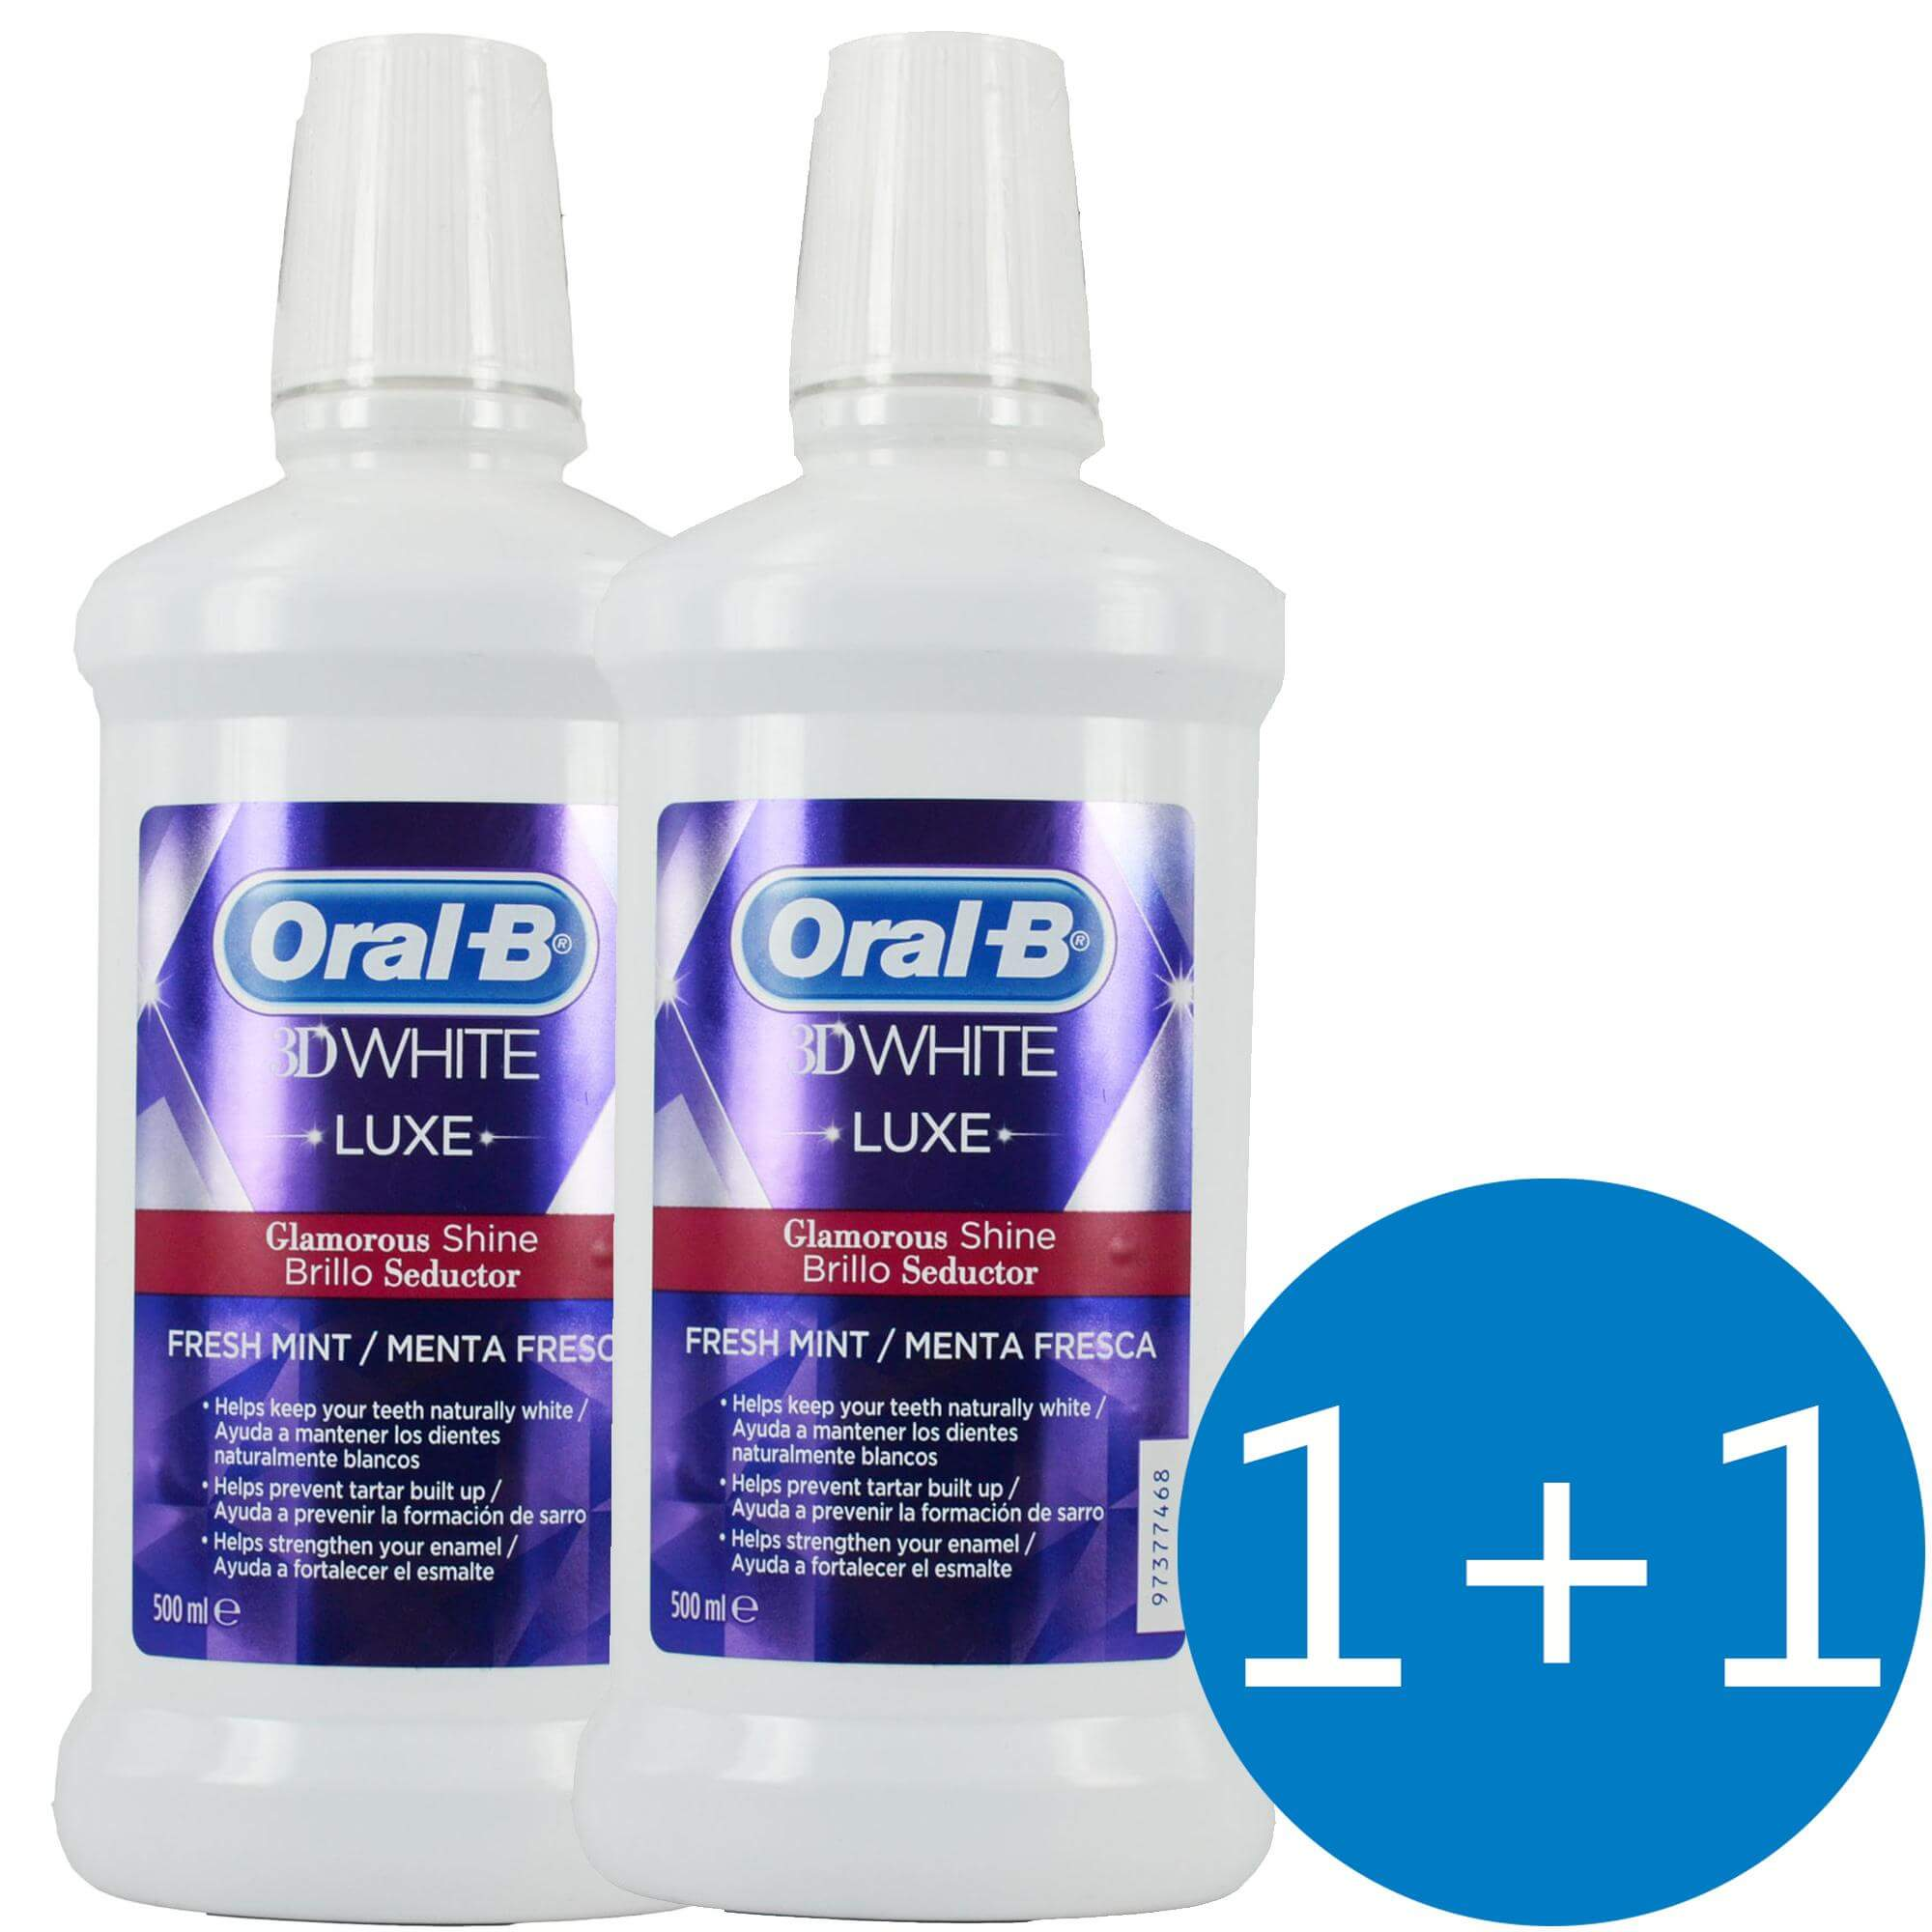 Oral-B Πακέτο Προσφοράς 3D White Luxe Glamorous Shine Στοματικό Διάλυμα για Λευκά Δόντια με Άρωμα Μέντας 500ml 1+1 Δώρο